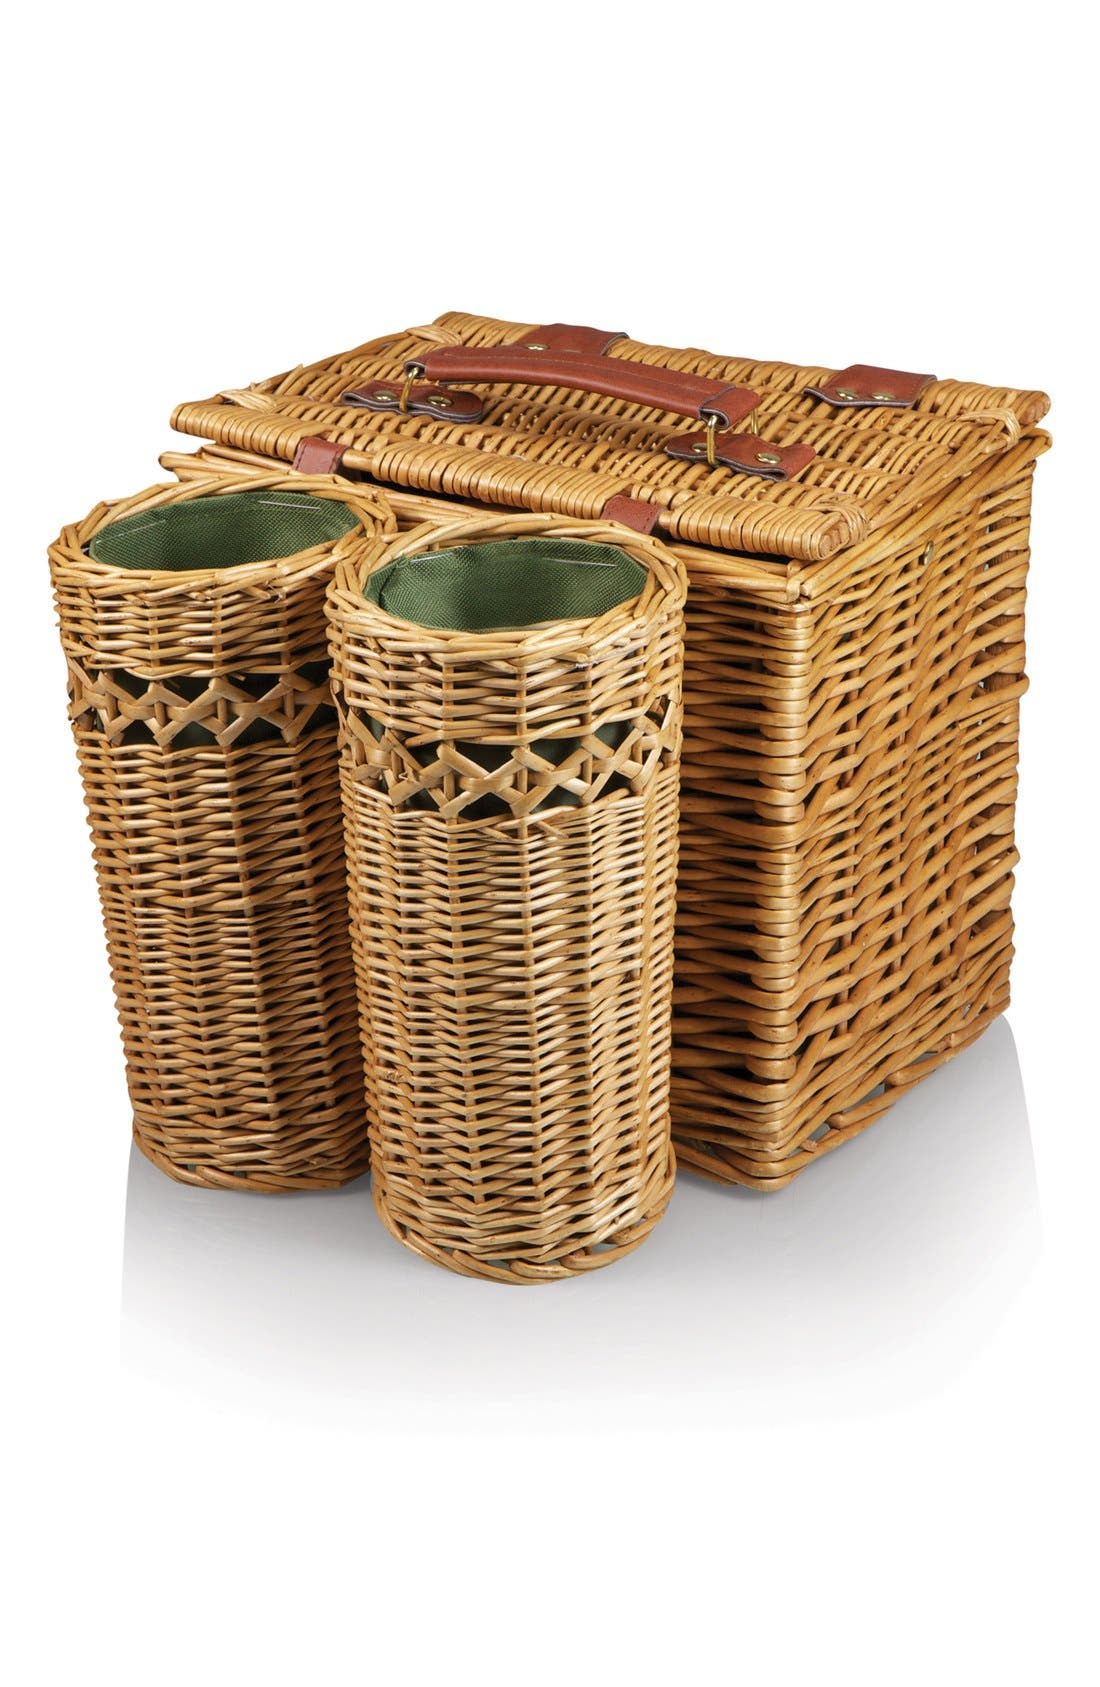 'Vino' Wine & Cheese Picnic Basket,                             Alternate thumbnail 2, color,                             300